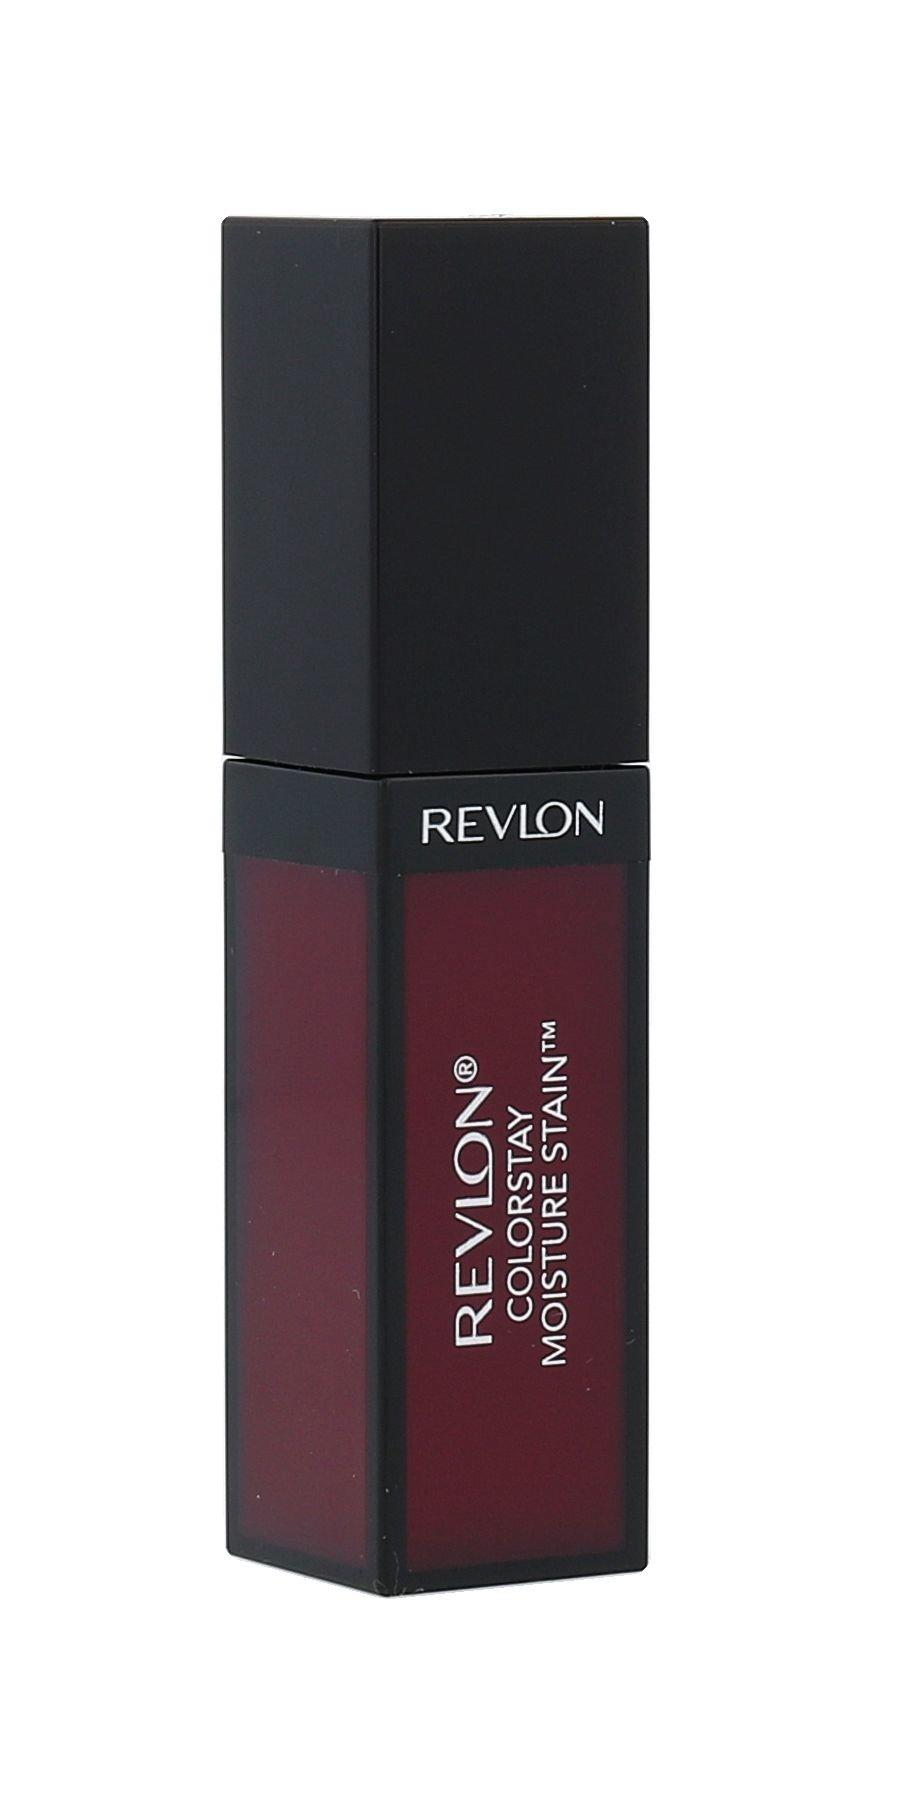 Revlon Colorstay Cosmetic 8ml 005 Parisian Passion